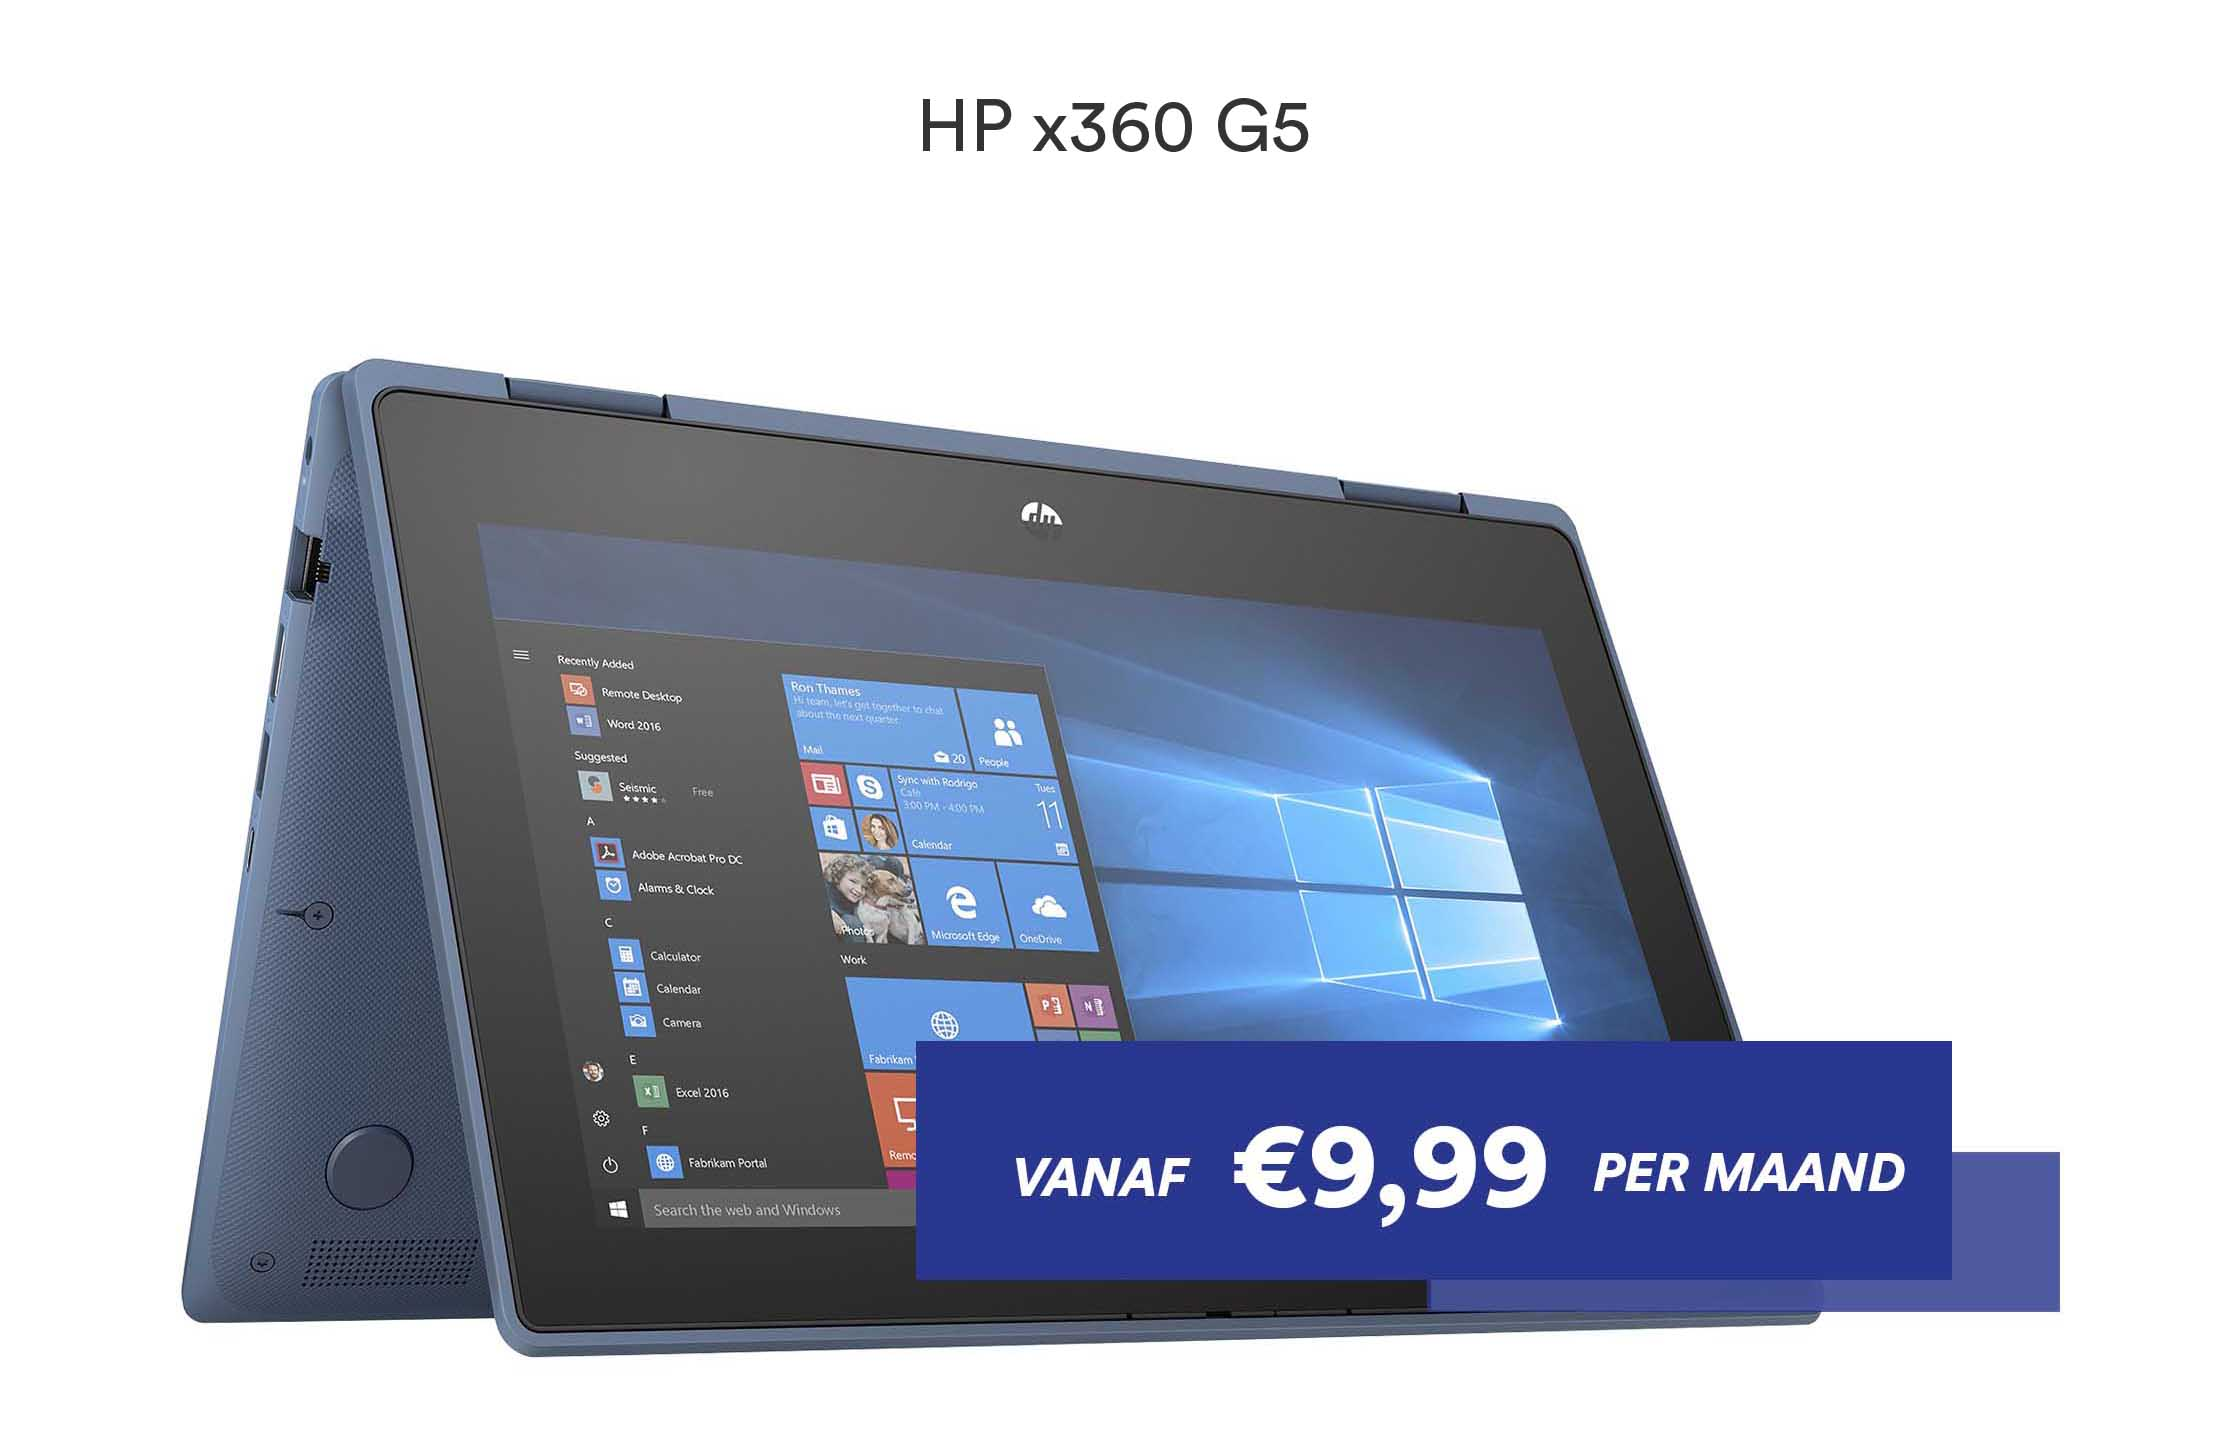 HP x360 G5